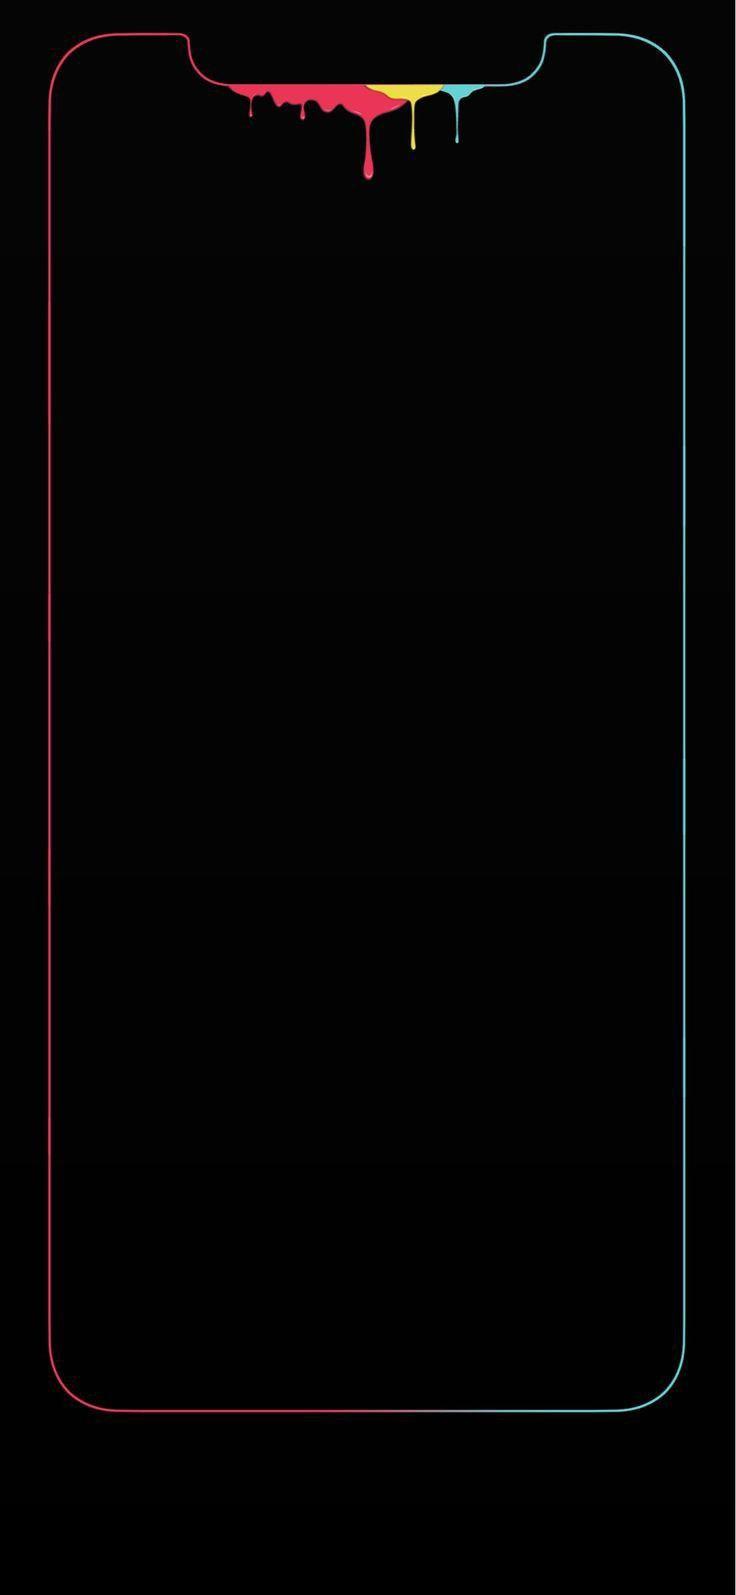 Notch Display Wallpapers Dark Wallpaper Iphone Oneplus Wallpapers Black Phone Wallpaper